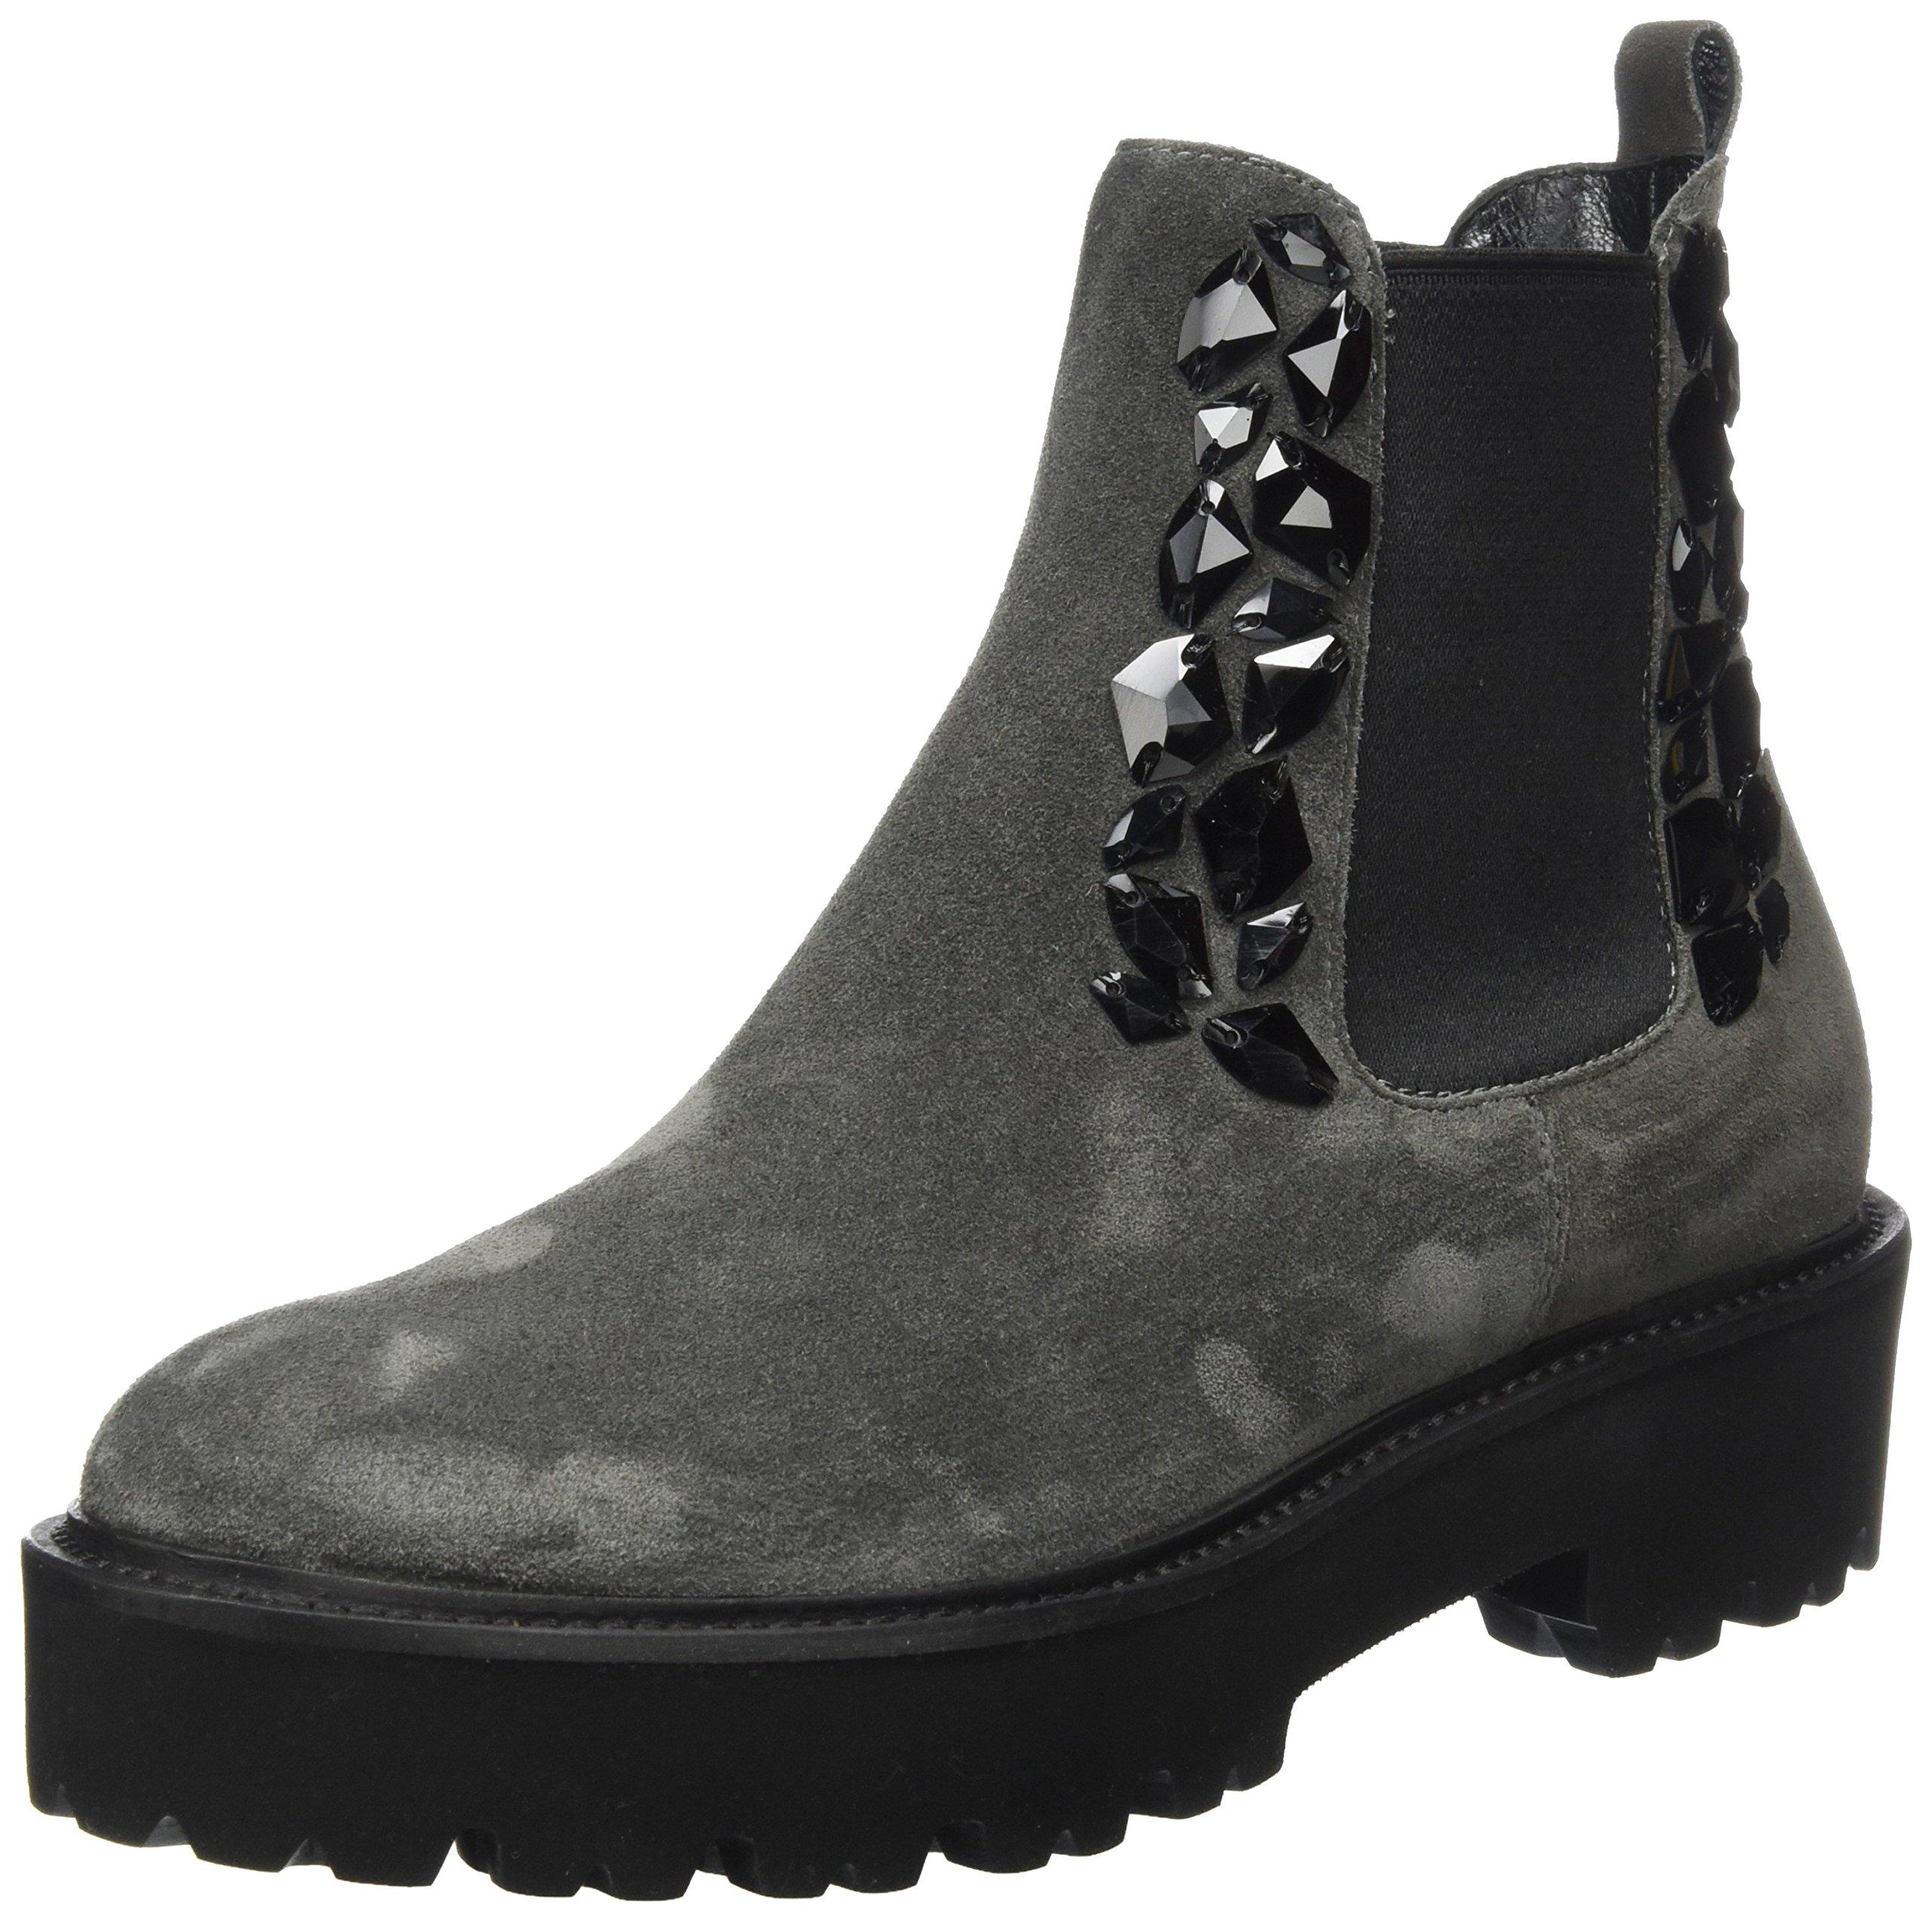 Eu Und black Schmenger 54739 Kennel Boots BobbyChelsea FemmeGrisantracite SzGqUVMp